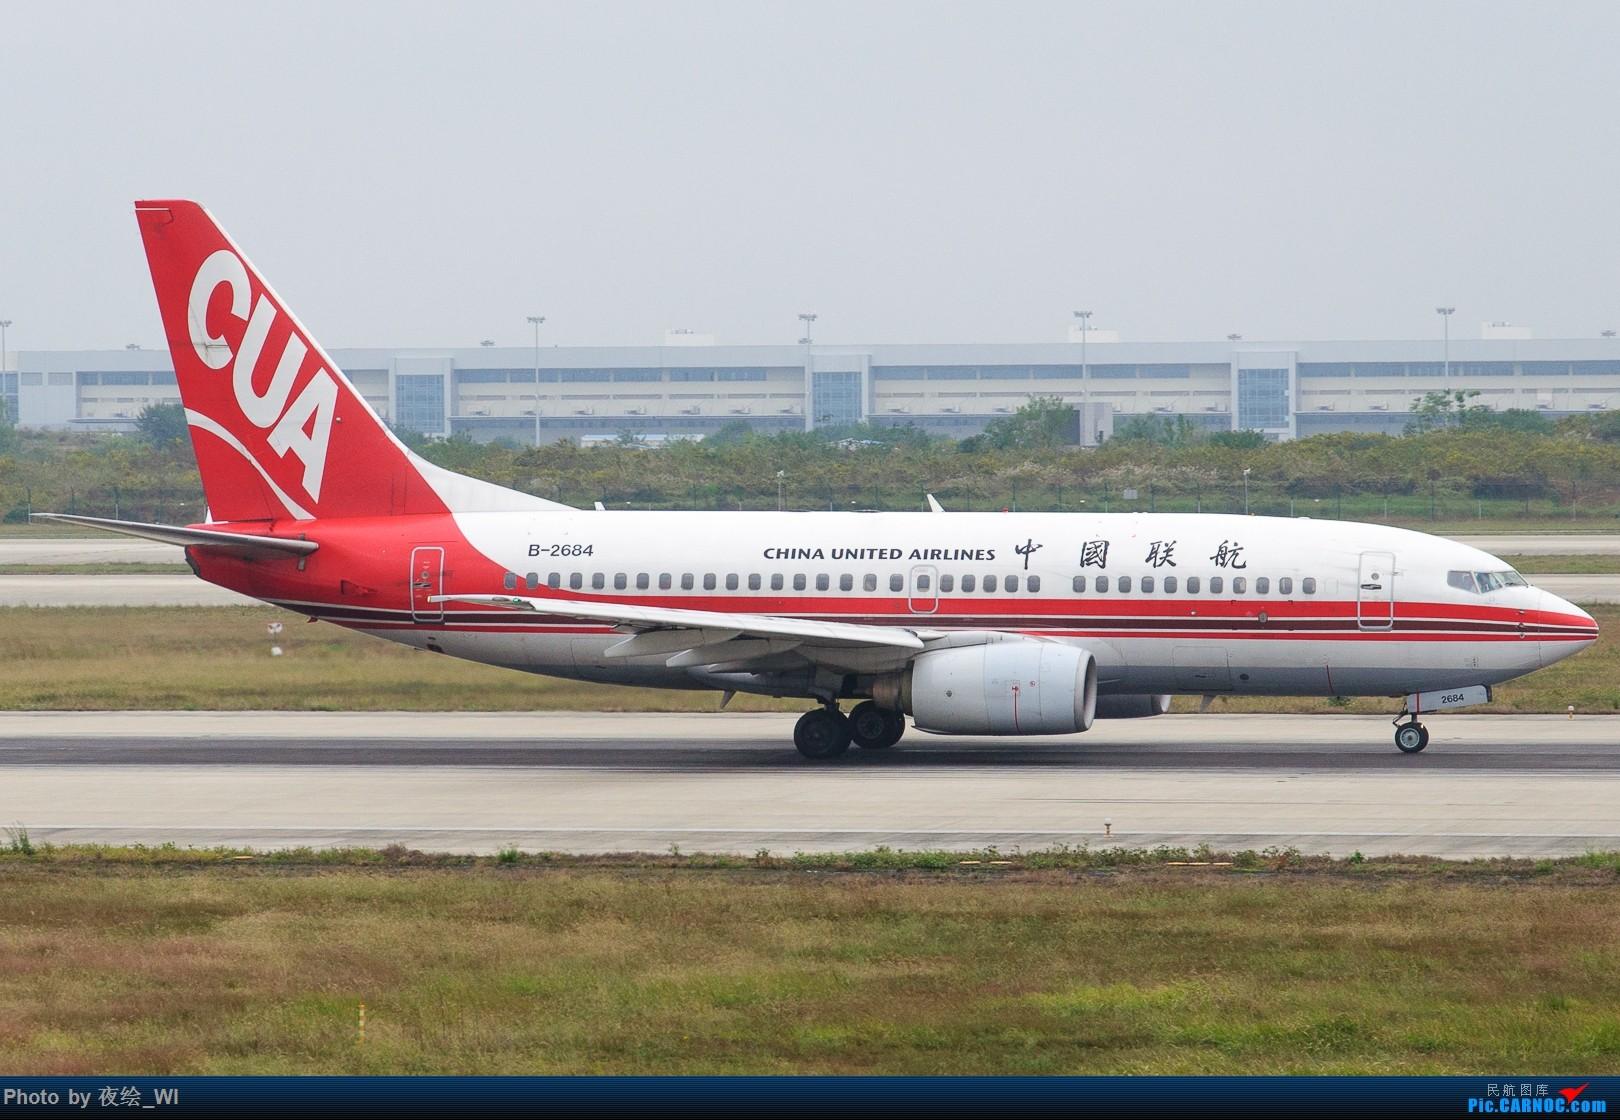 Re:[原创]【NKG】生日也要拍飞机,珍惜南京久违的单跑运行时光 BOEING 737-700 B-2684 中国南京禄口国际机场